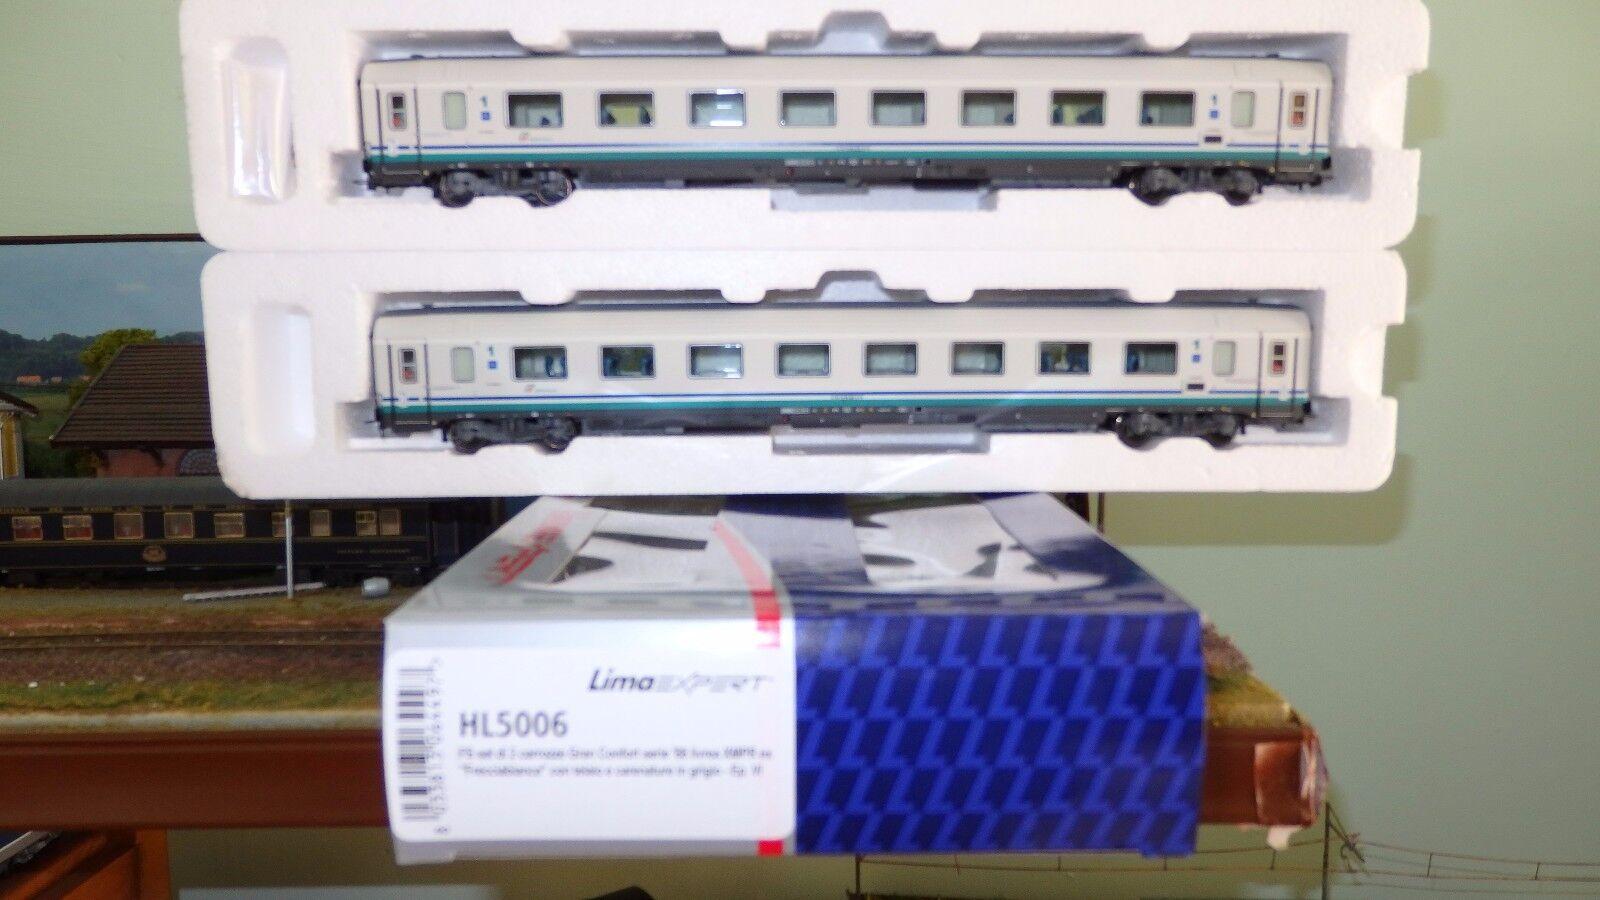 LIMA EXPERT HL5006 Set 2 Gran Confort 1985  1a cl. XMPR telaio grigio scuro